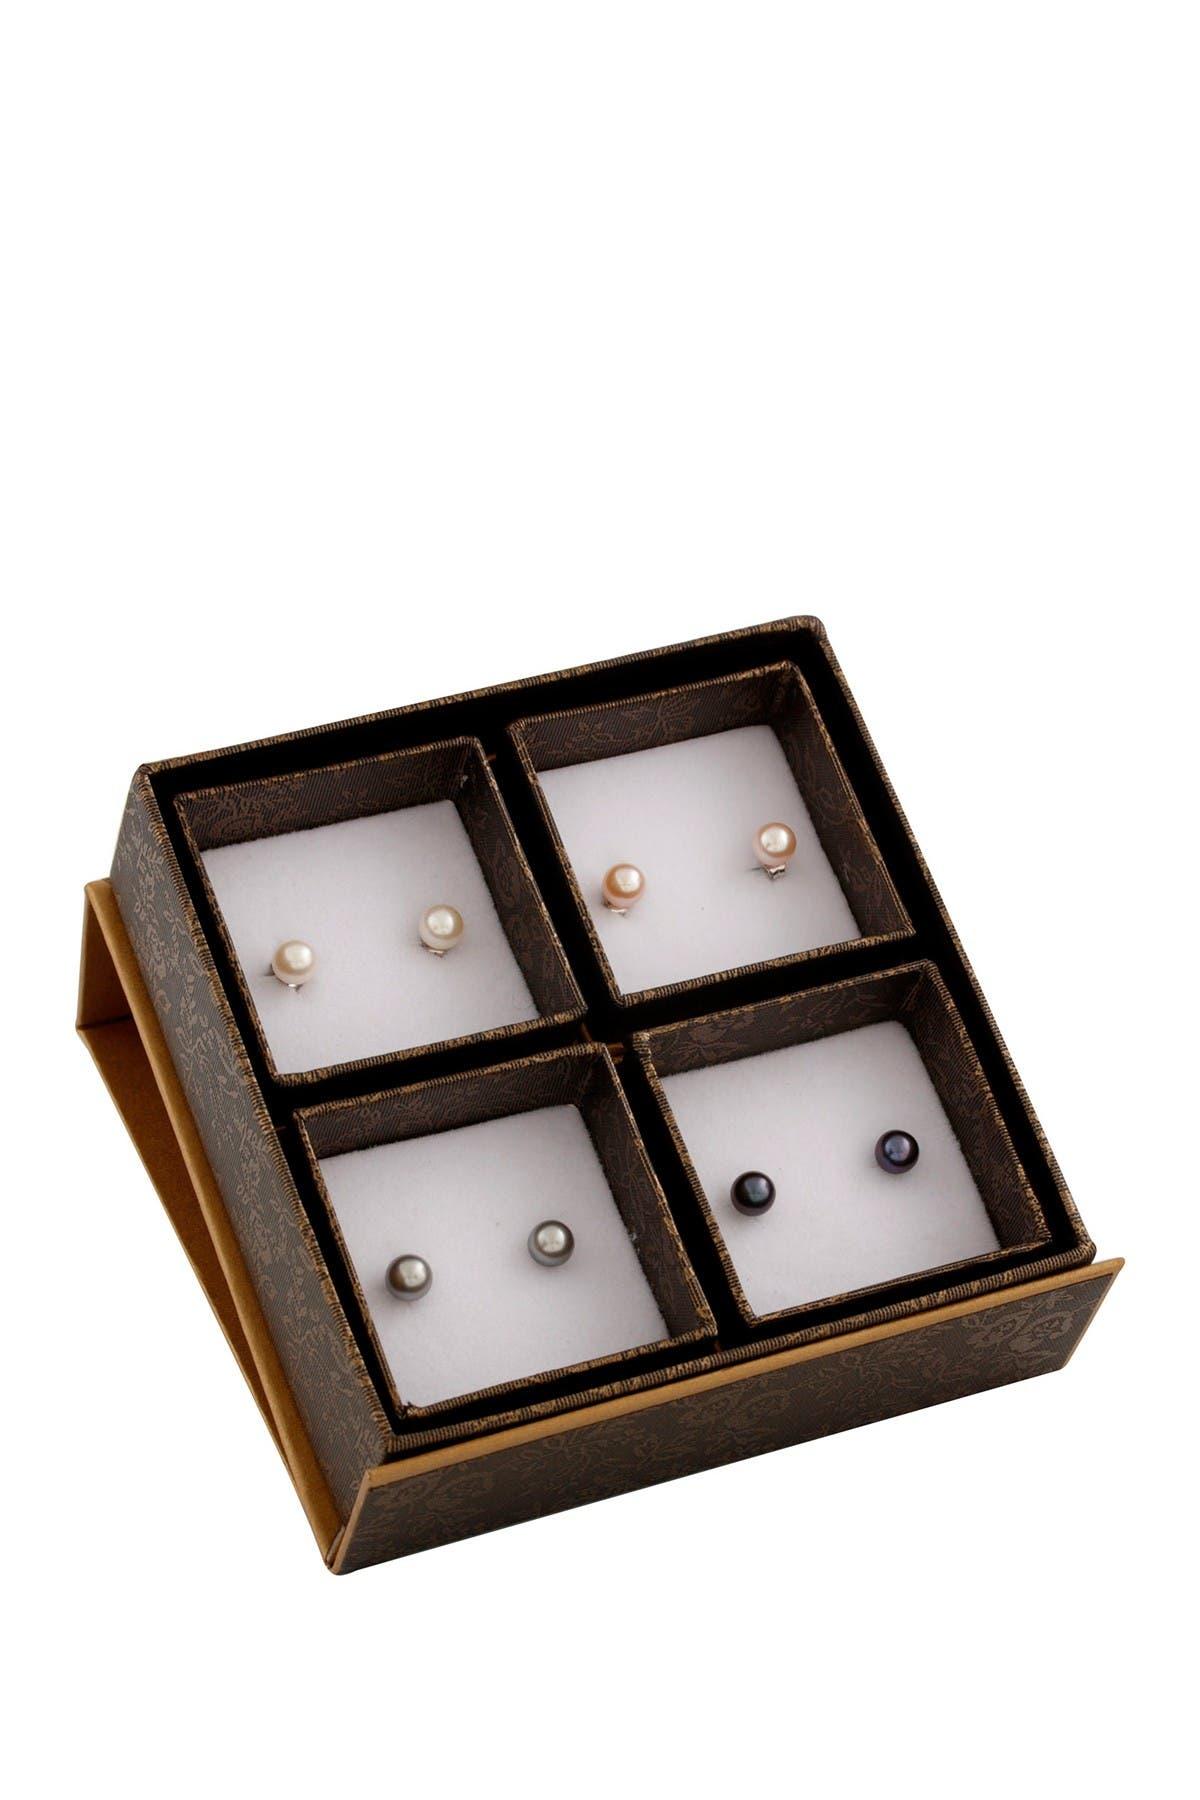 Image of Splendid Pearls Assorted Multicolor 6-6.5mm Pearl Stud Earrings Set